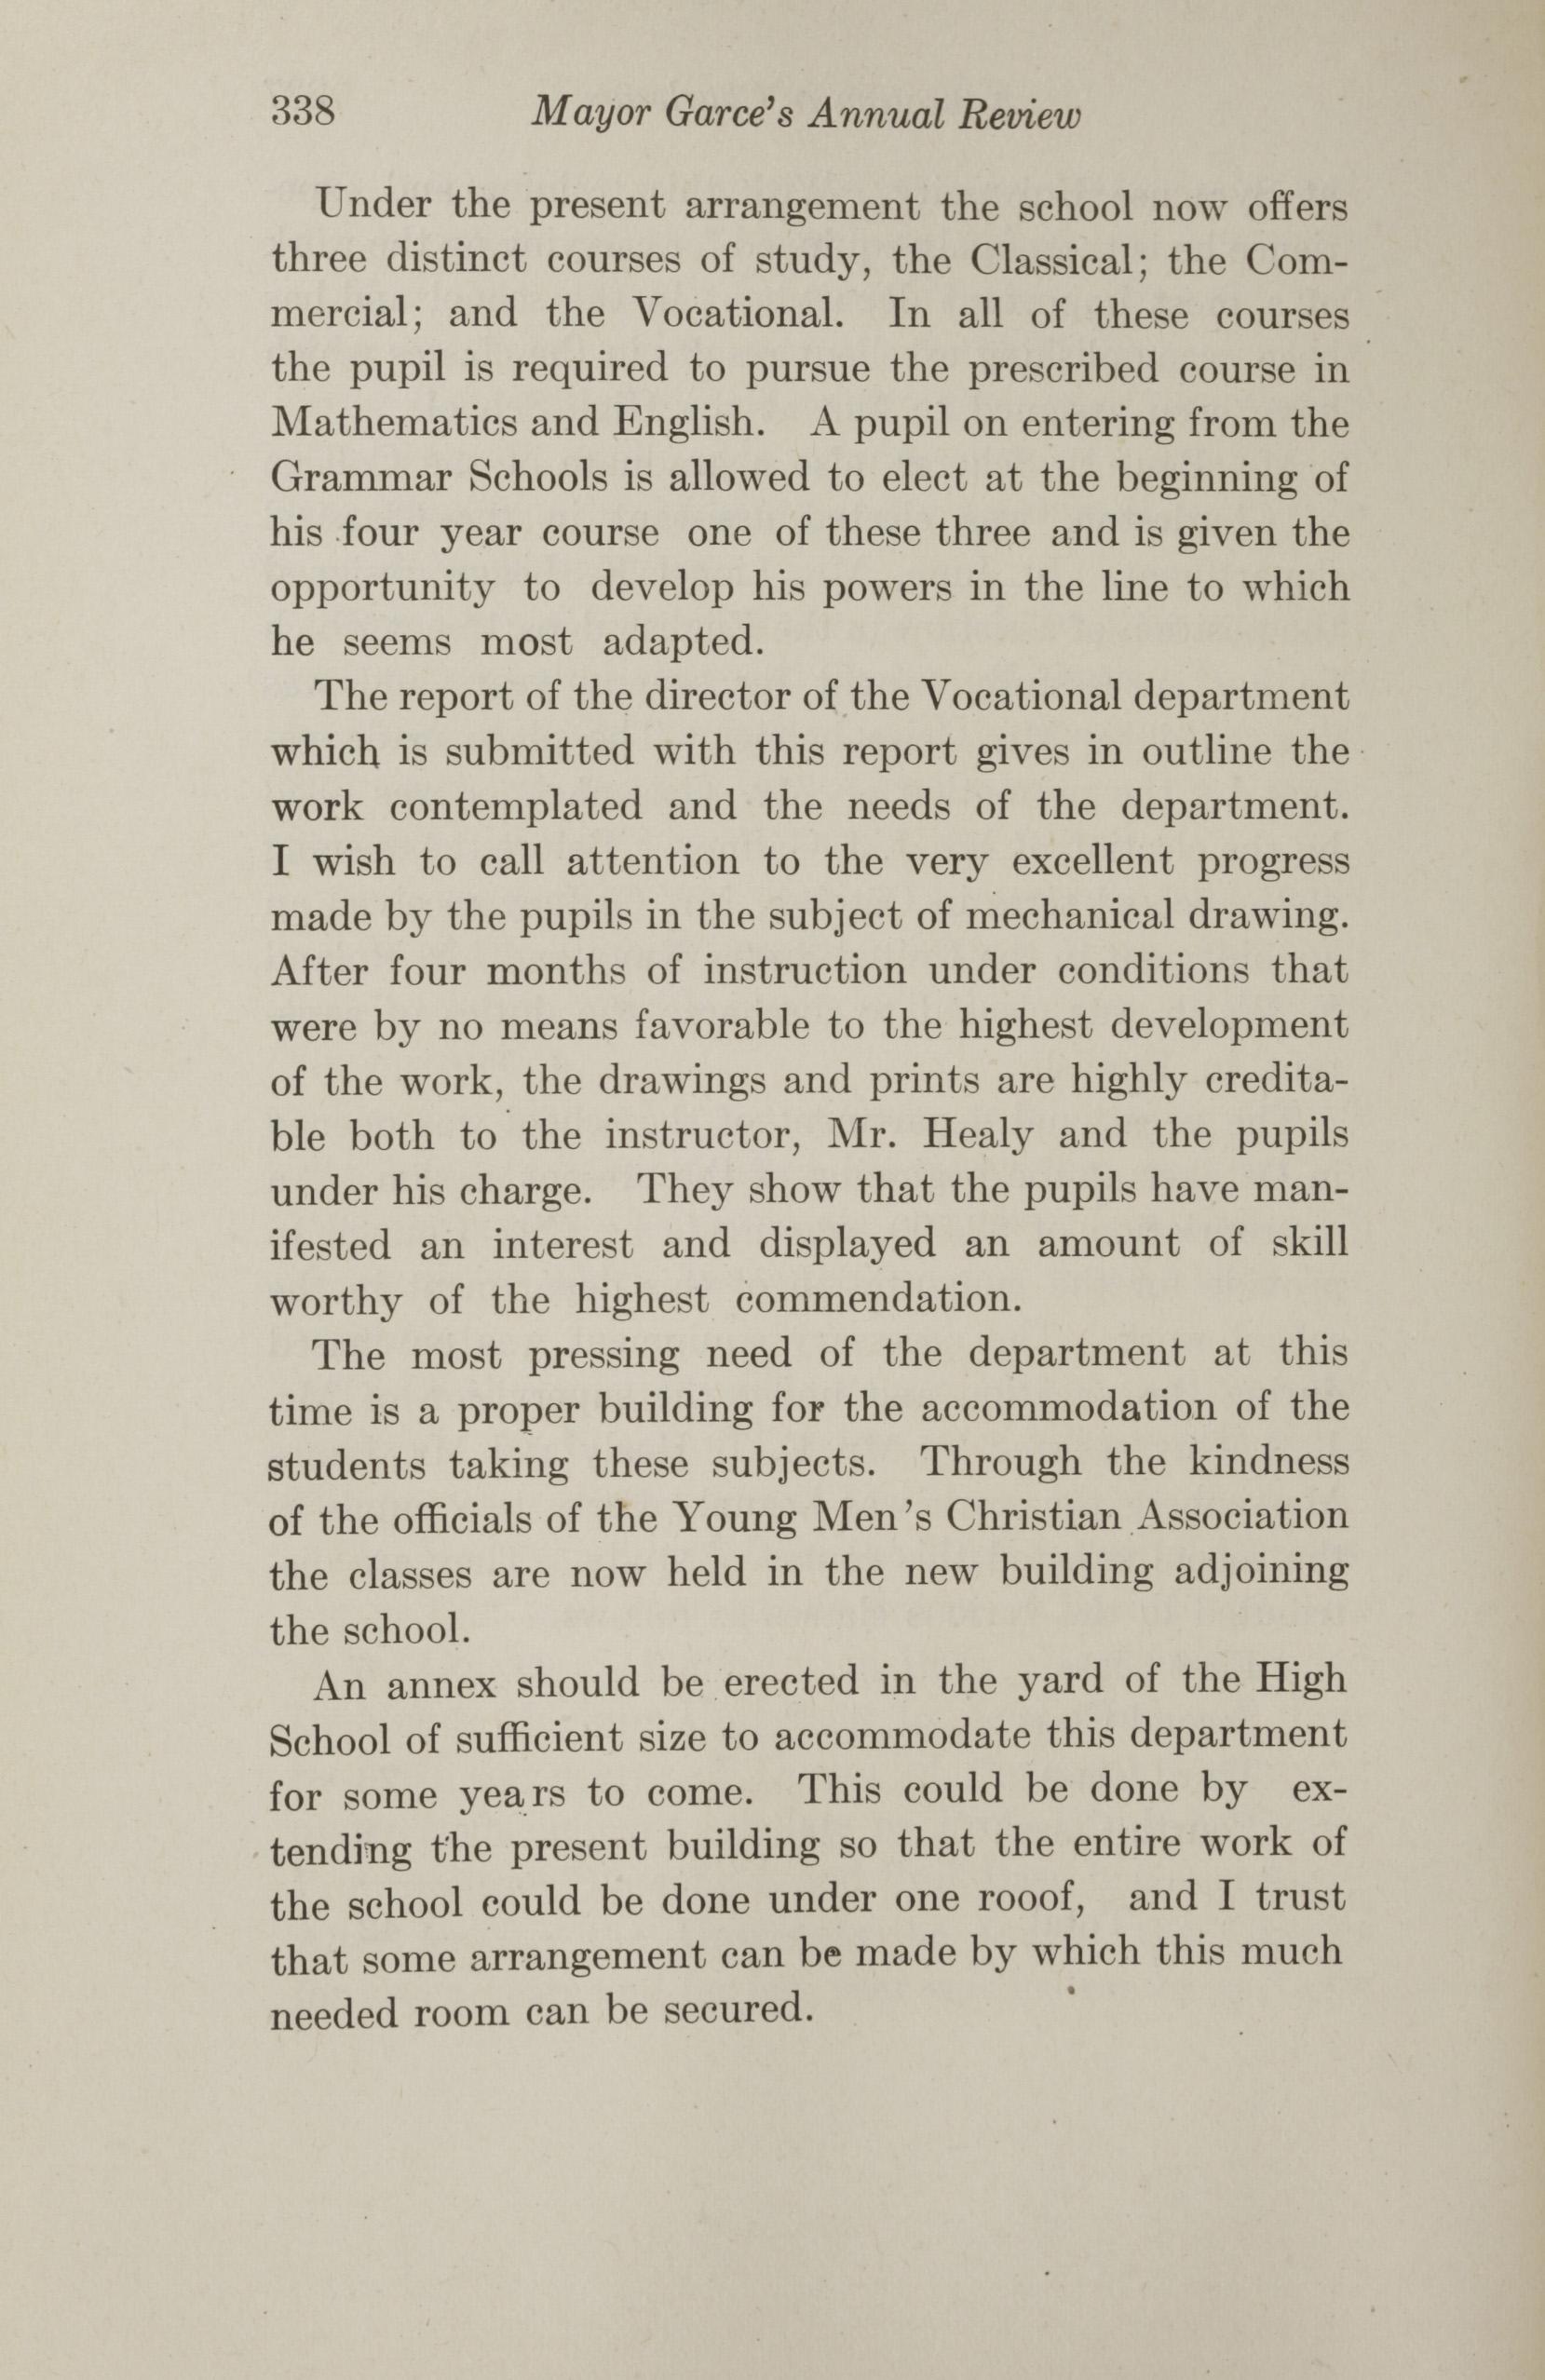 Charleston Yearbook, 1912, page 338